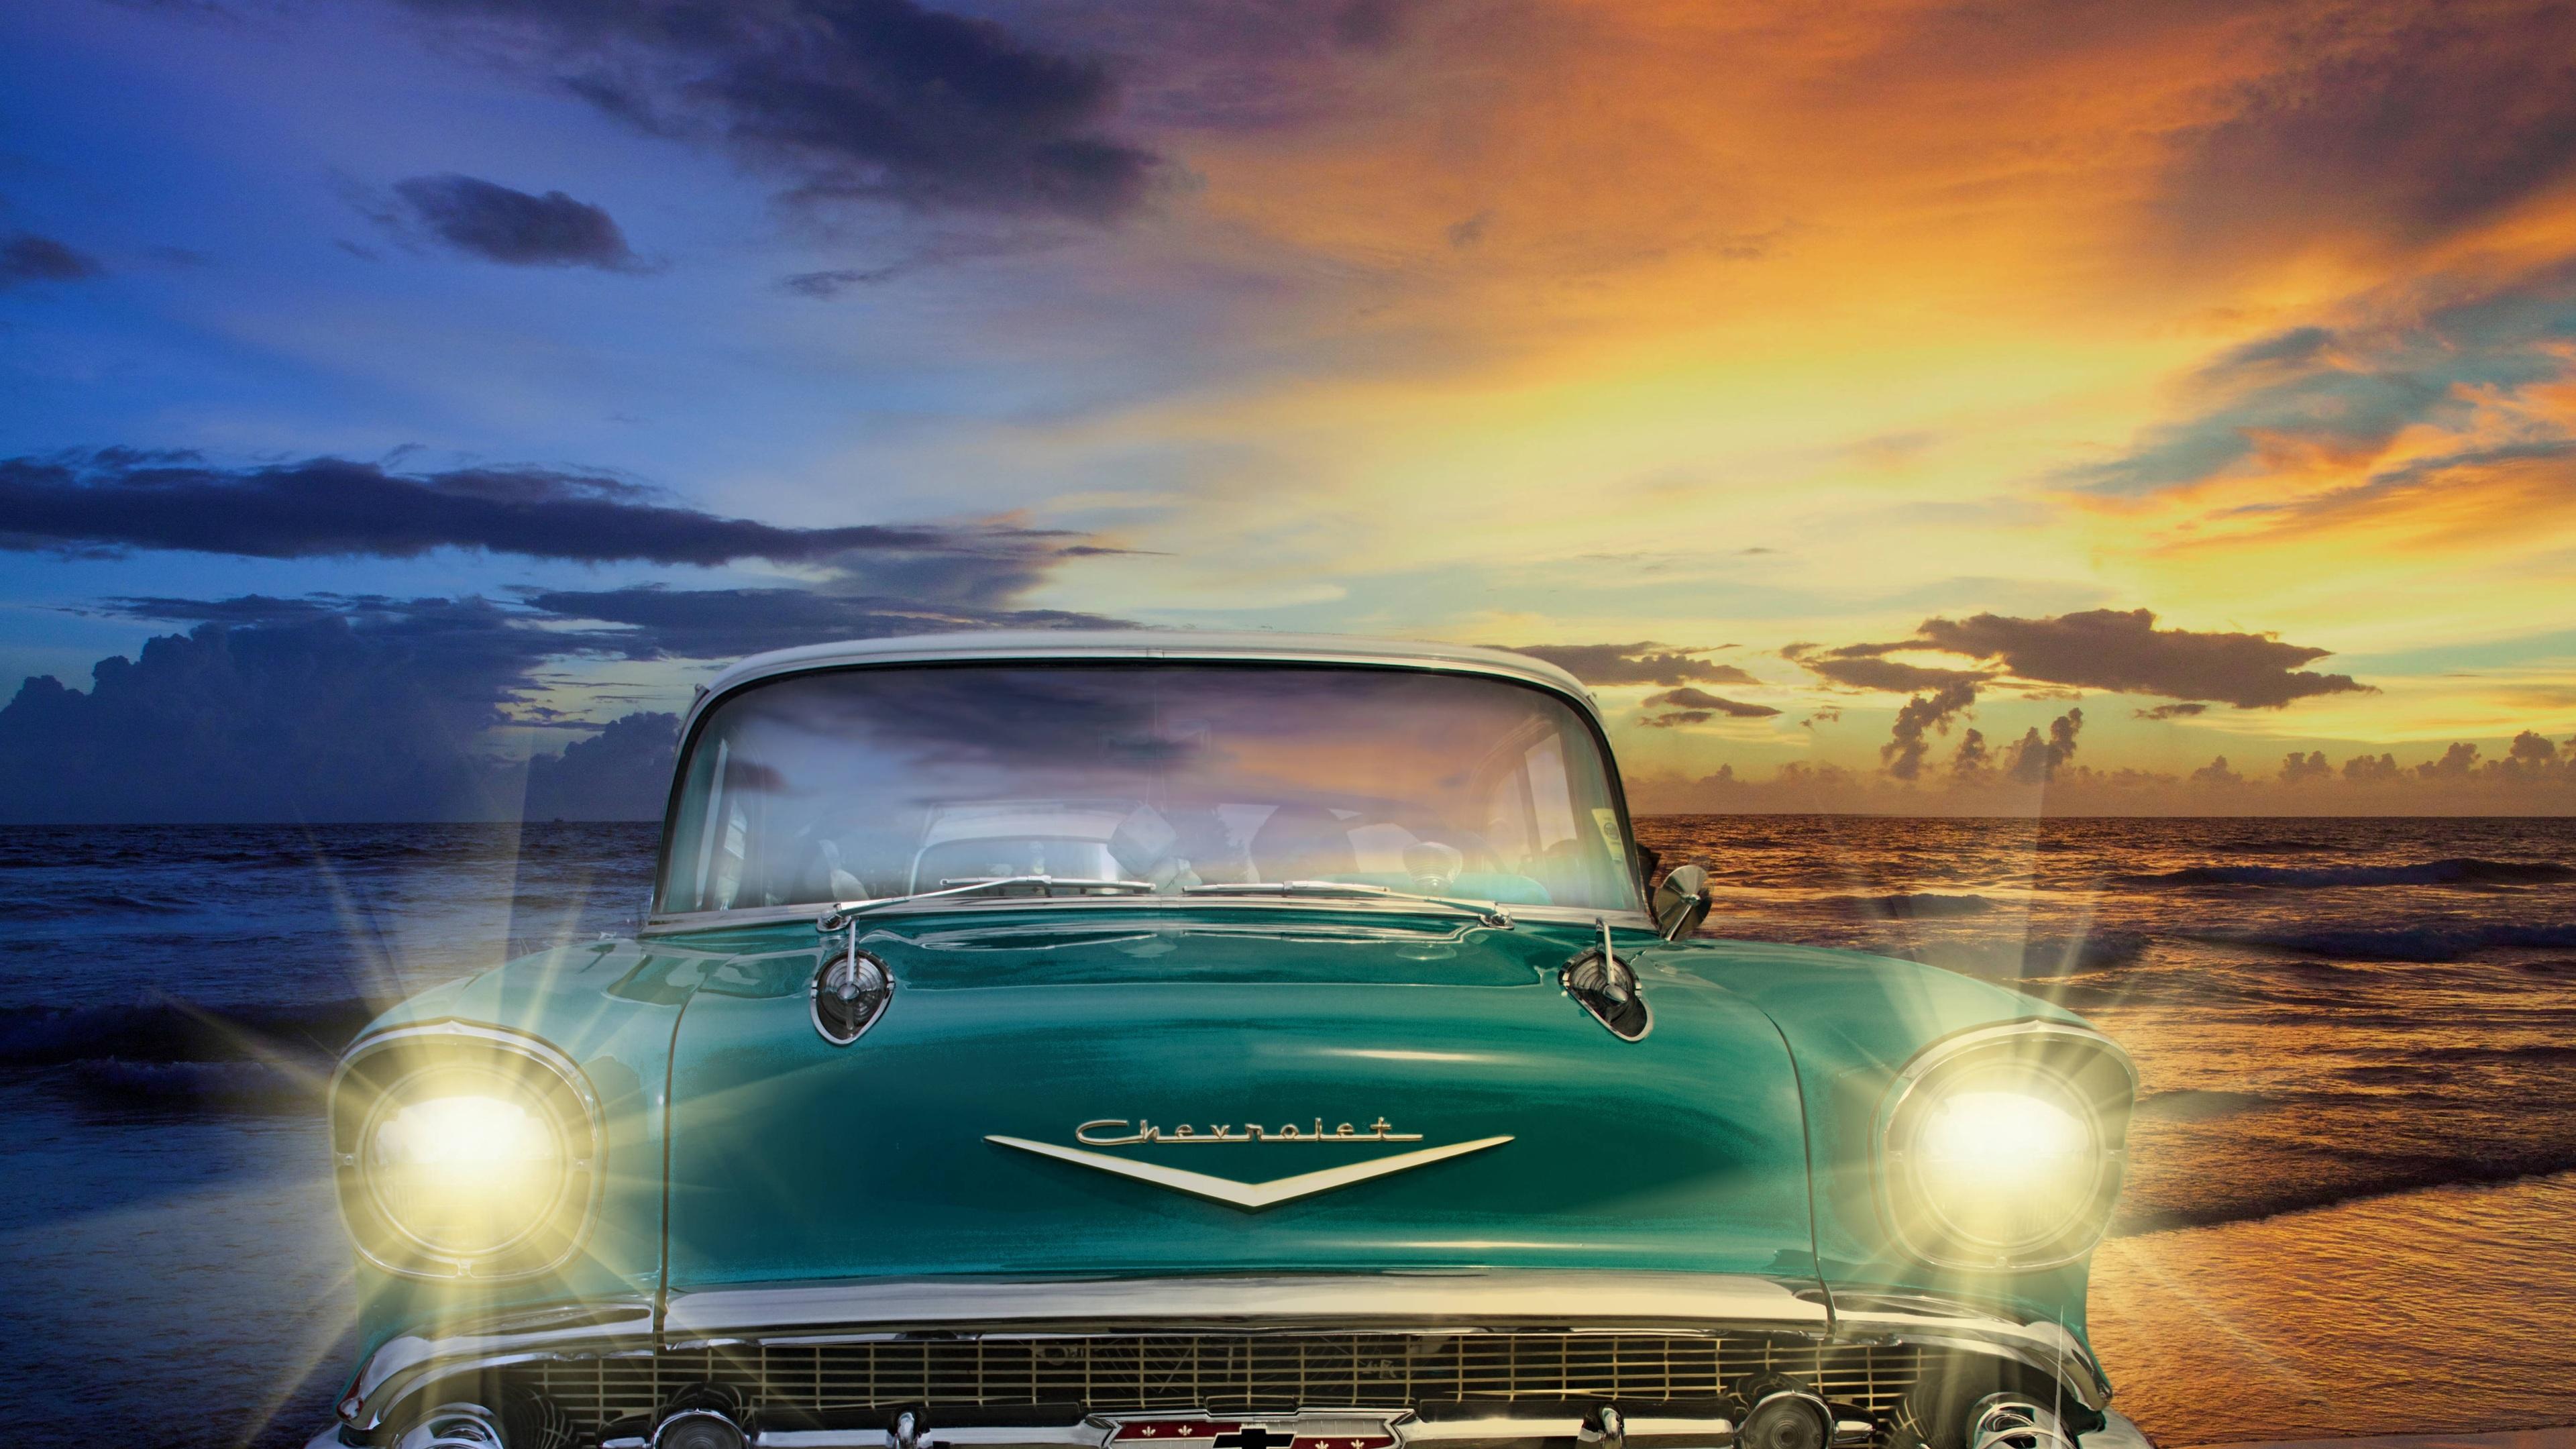 Chevrolet Old Retro Classic Vintage Car Classic Car Wallpaper 4k 3029805 Hd Wallpaper Backgrounds Download